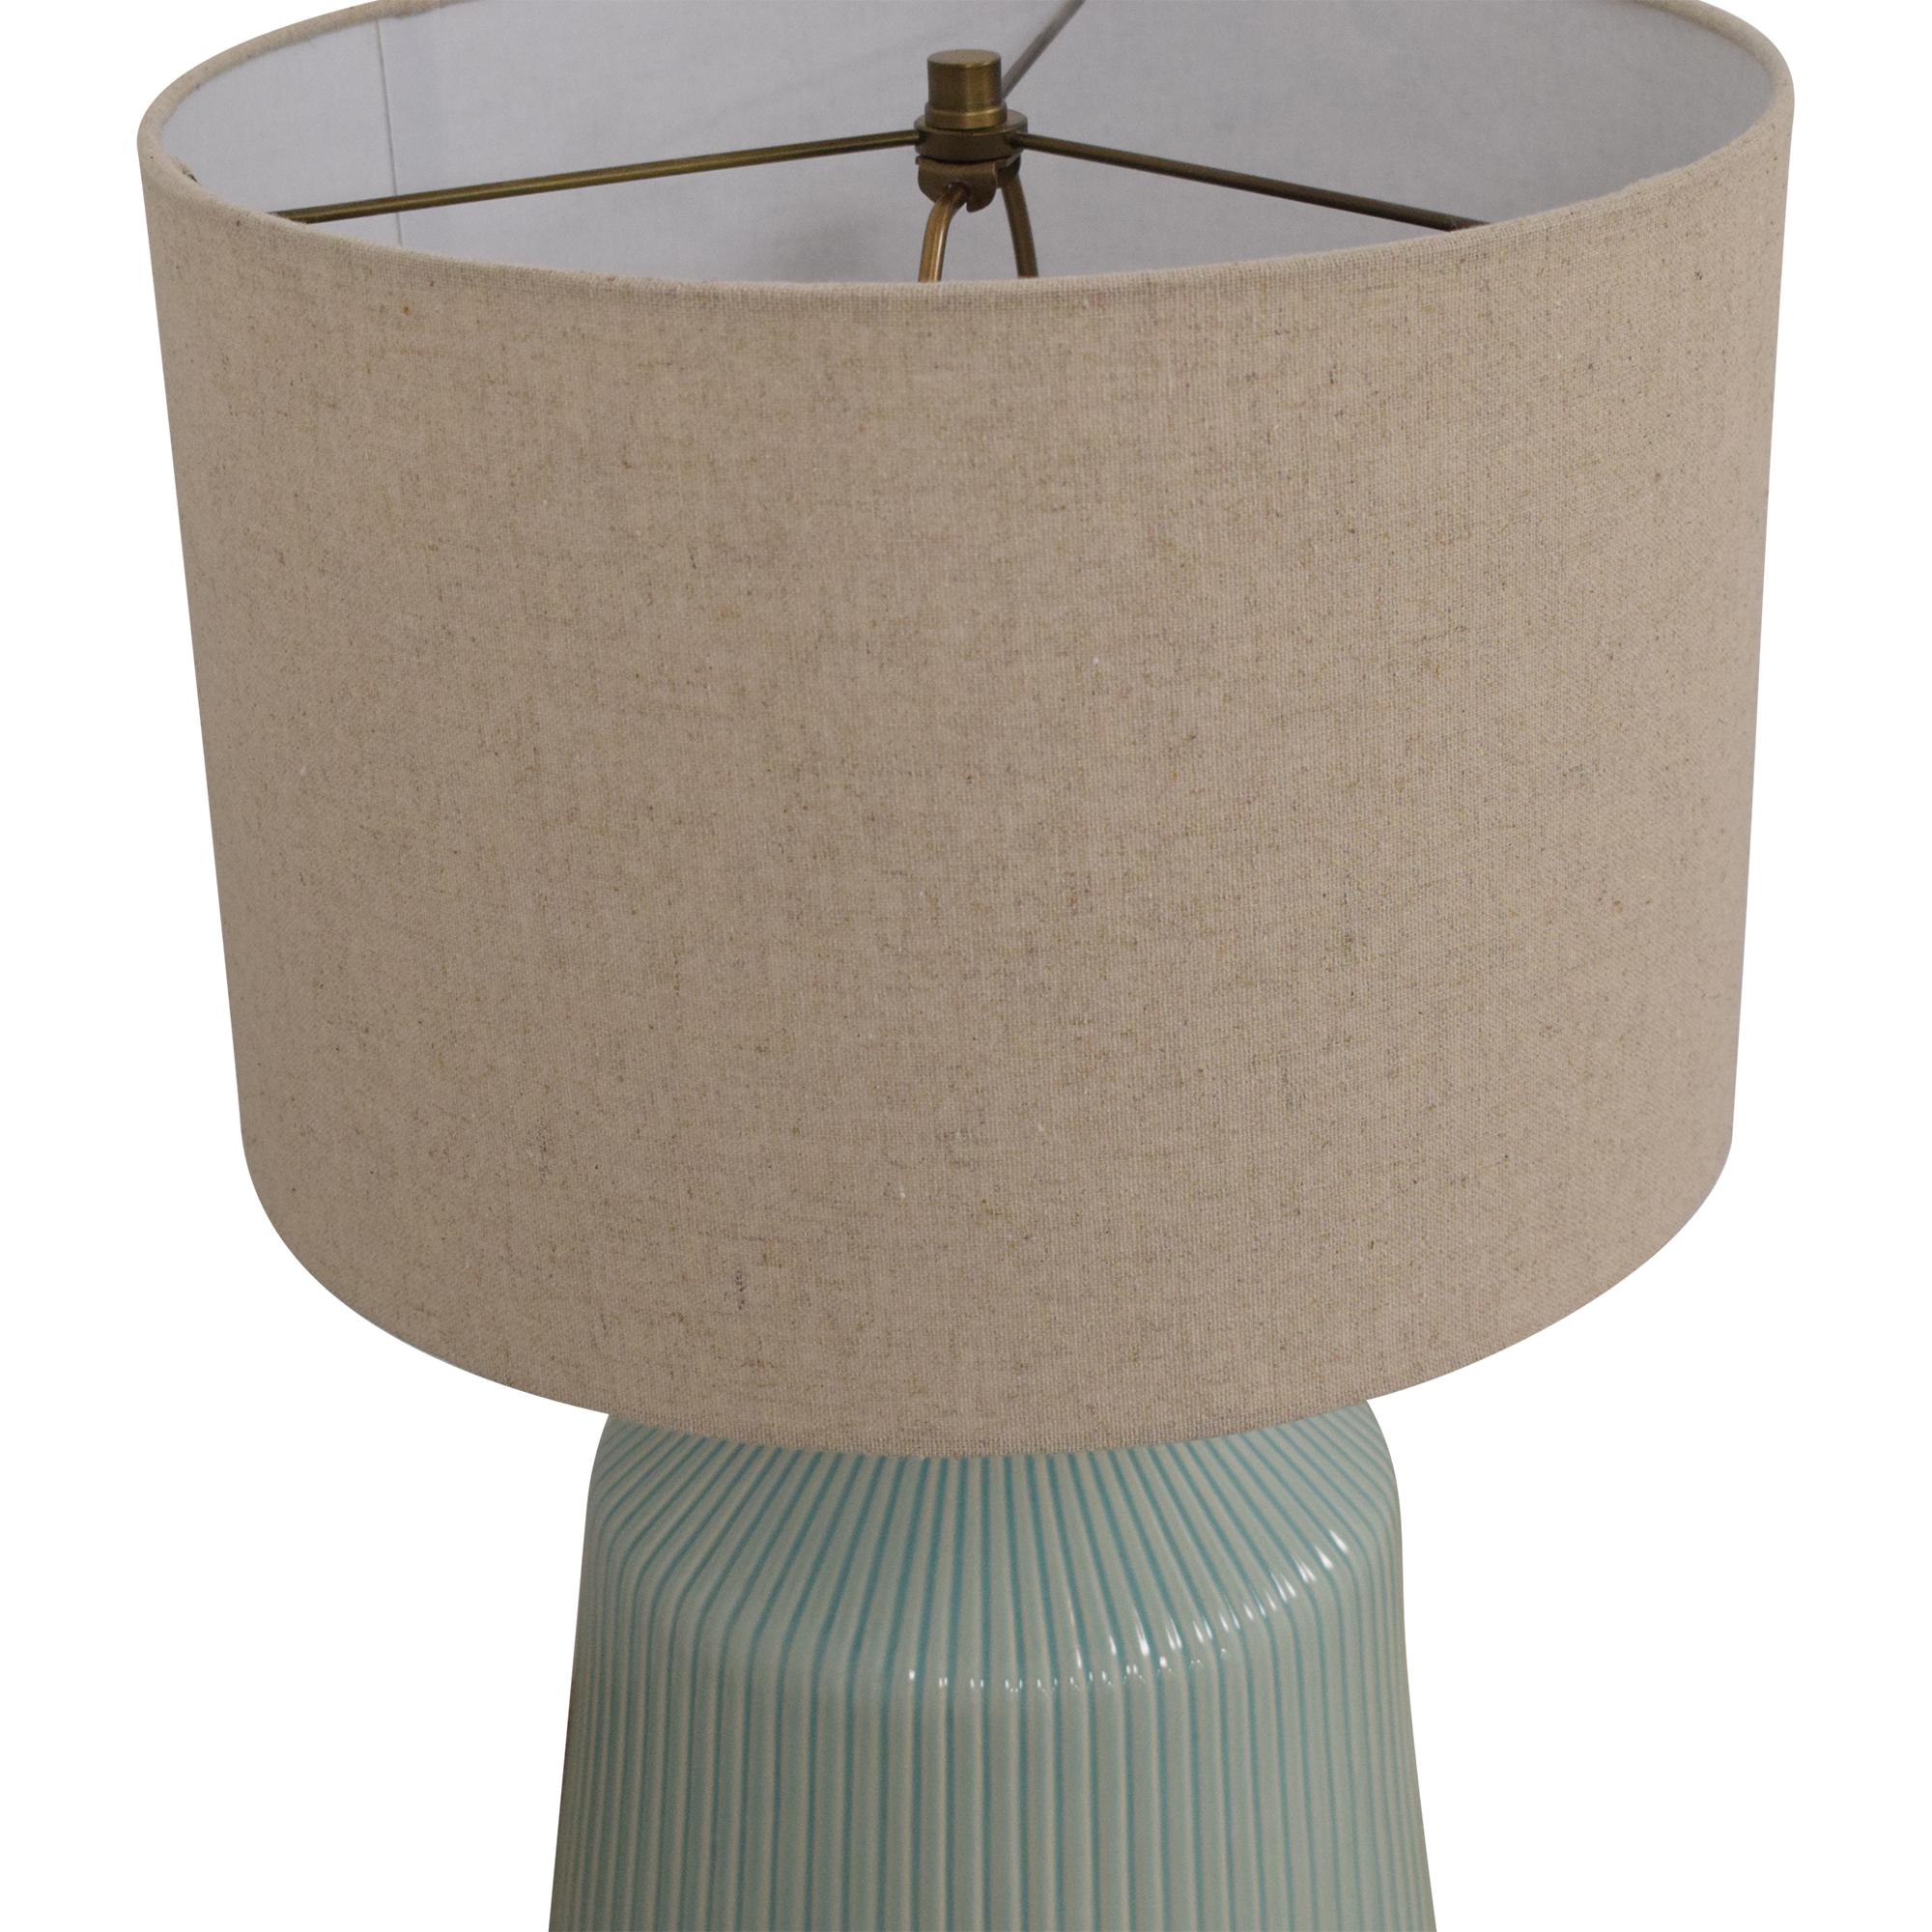 West Elm West Elm Roar & Rabbit Lamp second hand